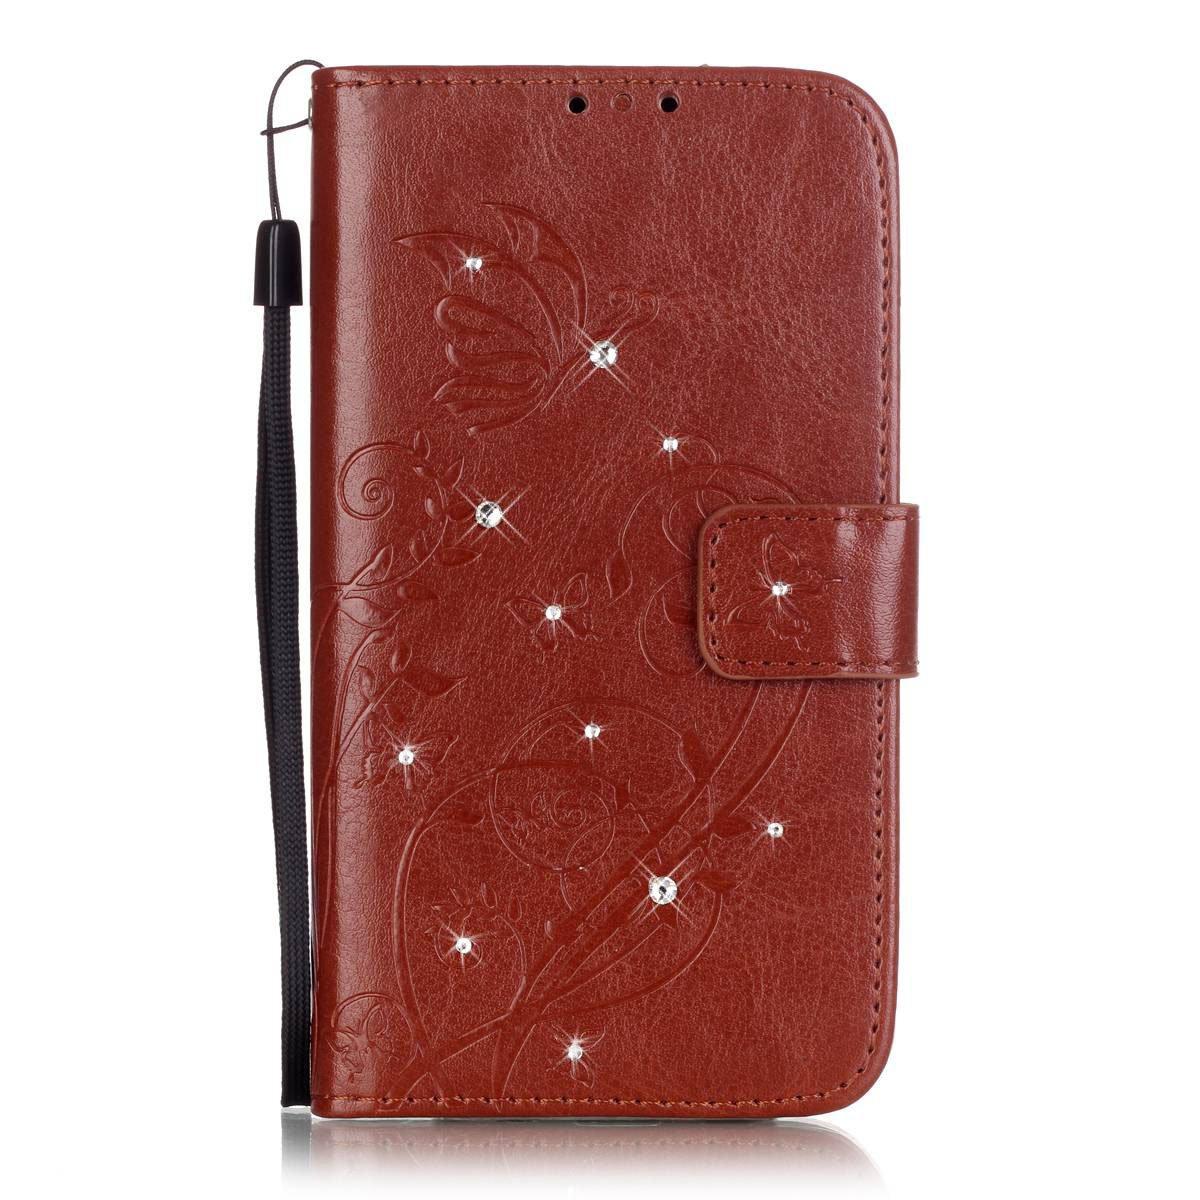 IKASEFU Bling /グリッター/ダイヤモンドPUレザーバタフライフラワーパターンフォリオ財布型フリップ保護ケースカバーwith Strap / Rope for Samsung Galaxy Note 5-butterfly、レッド Samsung Galaxy Note 5 WX7674X8   B01JE935JA